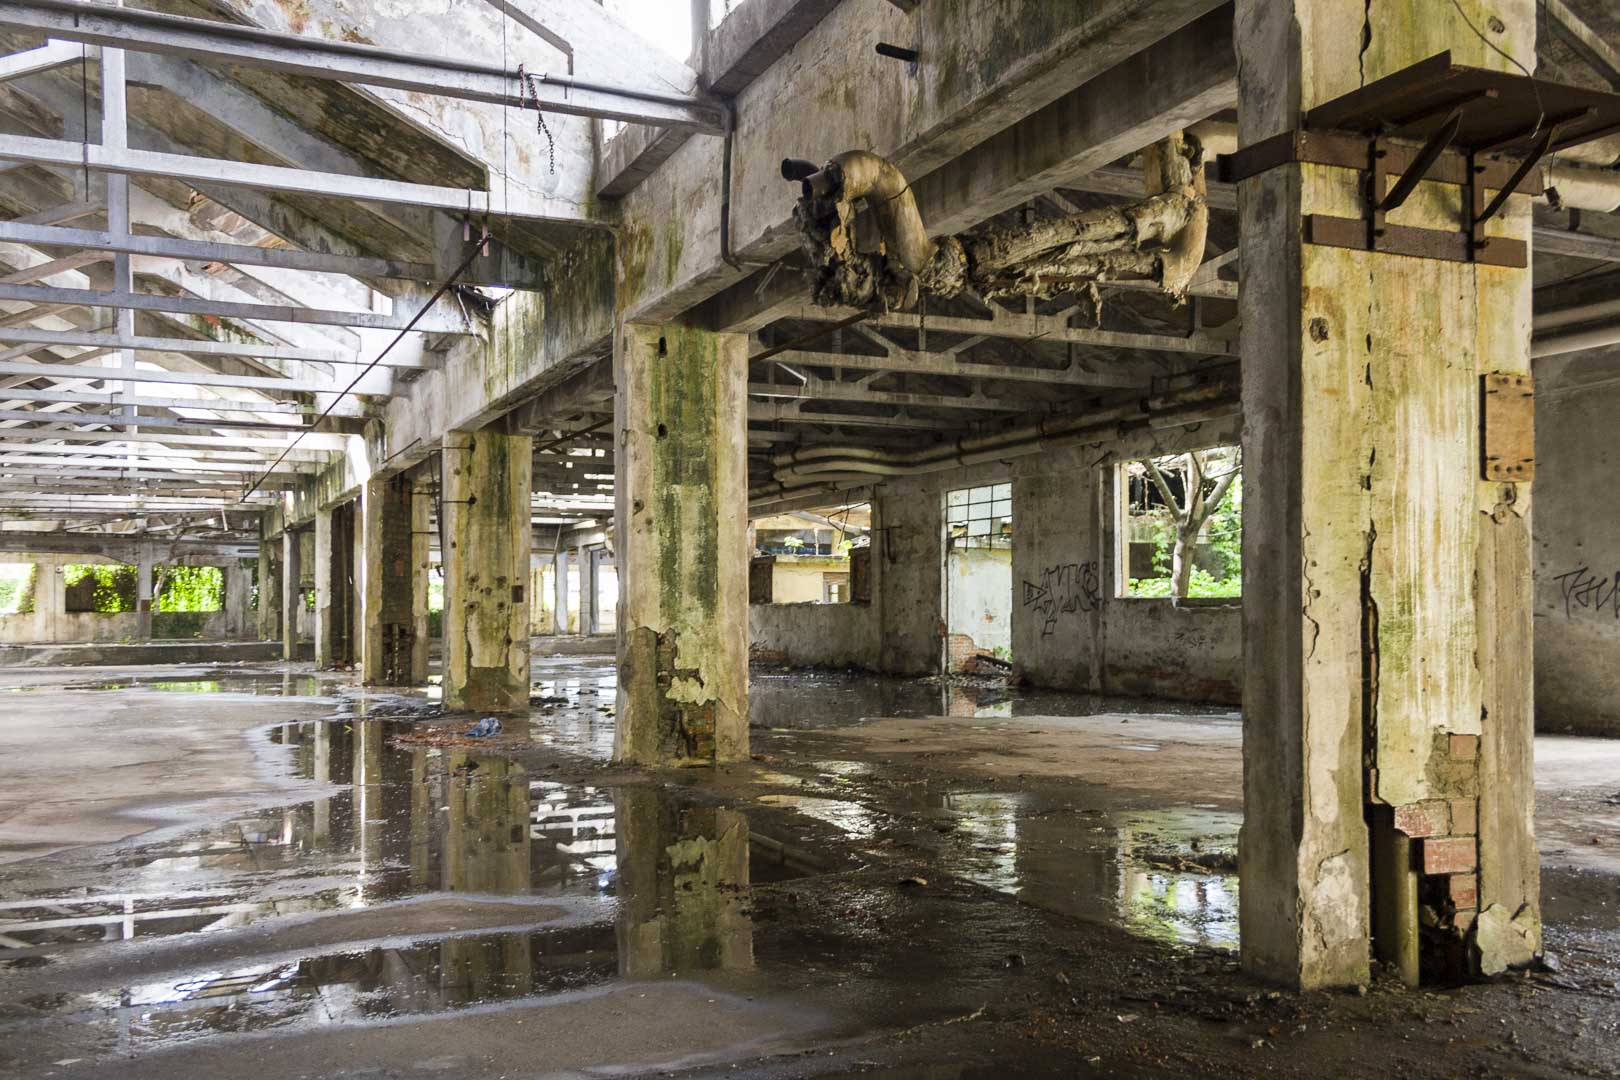 Garis – Abandoned Brakes Factory – Nichelino, Italy